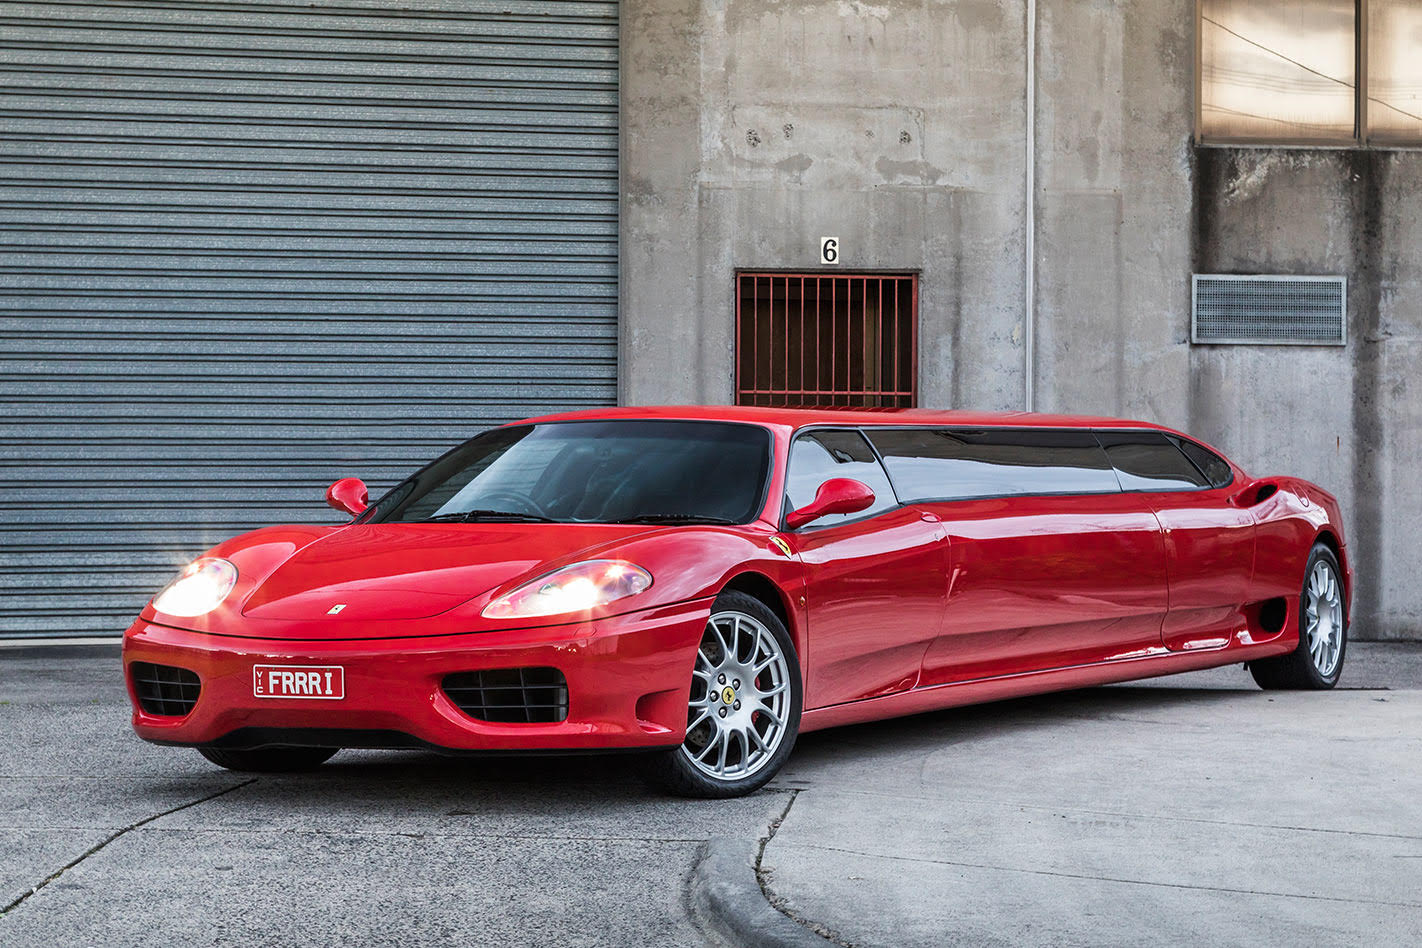 Ferrari Stretch Limousine Melbourne Worlds Fastest Limo